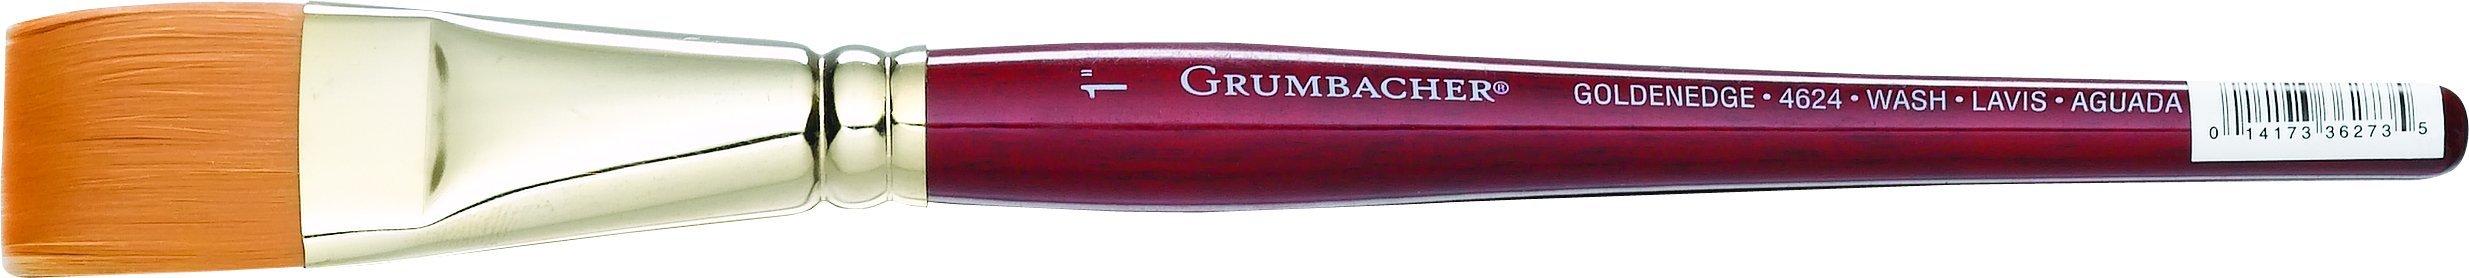 Grumbacher Goldenedge Golden Toray Wash Watercolor Brush, Synthetic Bristles, Size 1'' (4624.100)